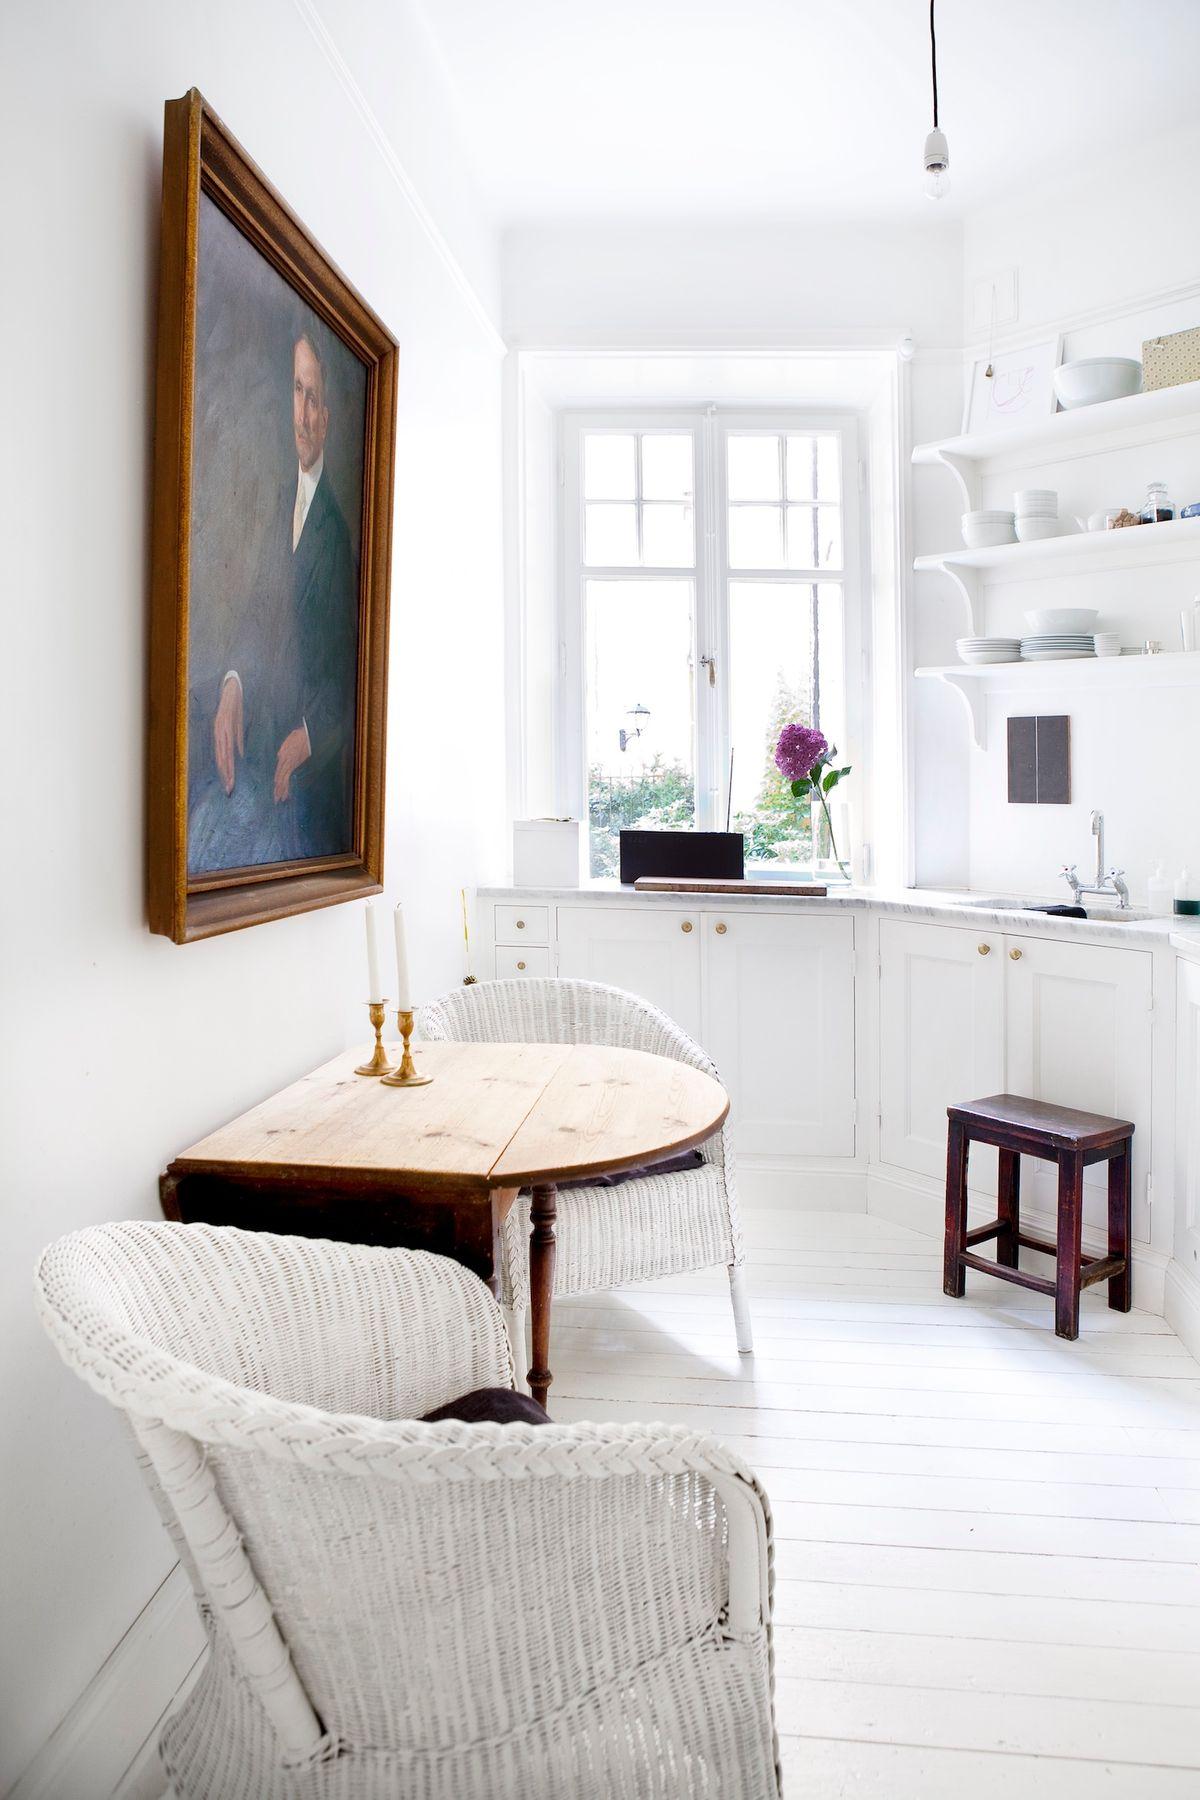 Pär Bengtsson Home Interior Editorial Photography36.jpeg